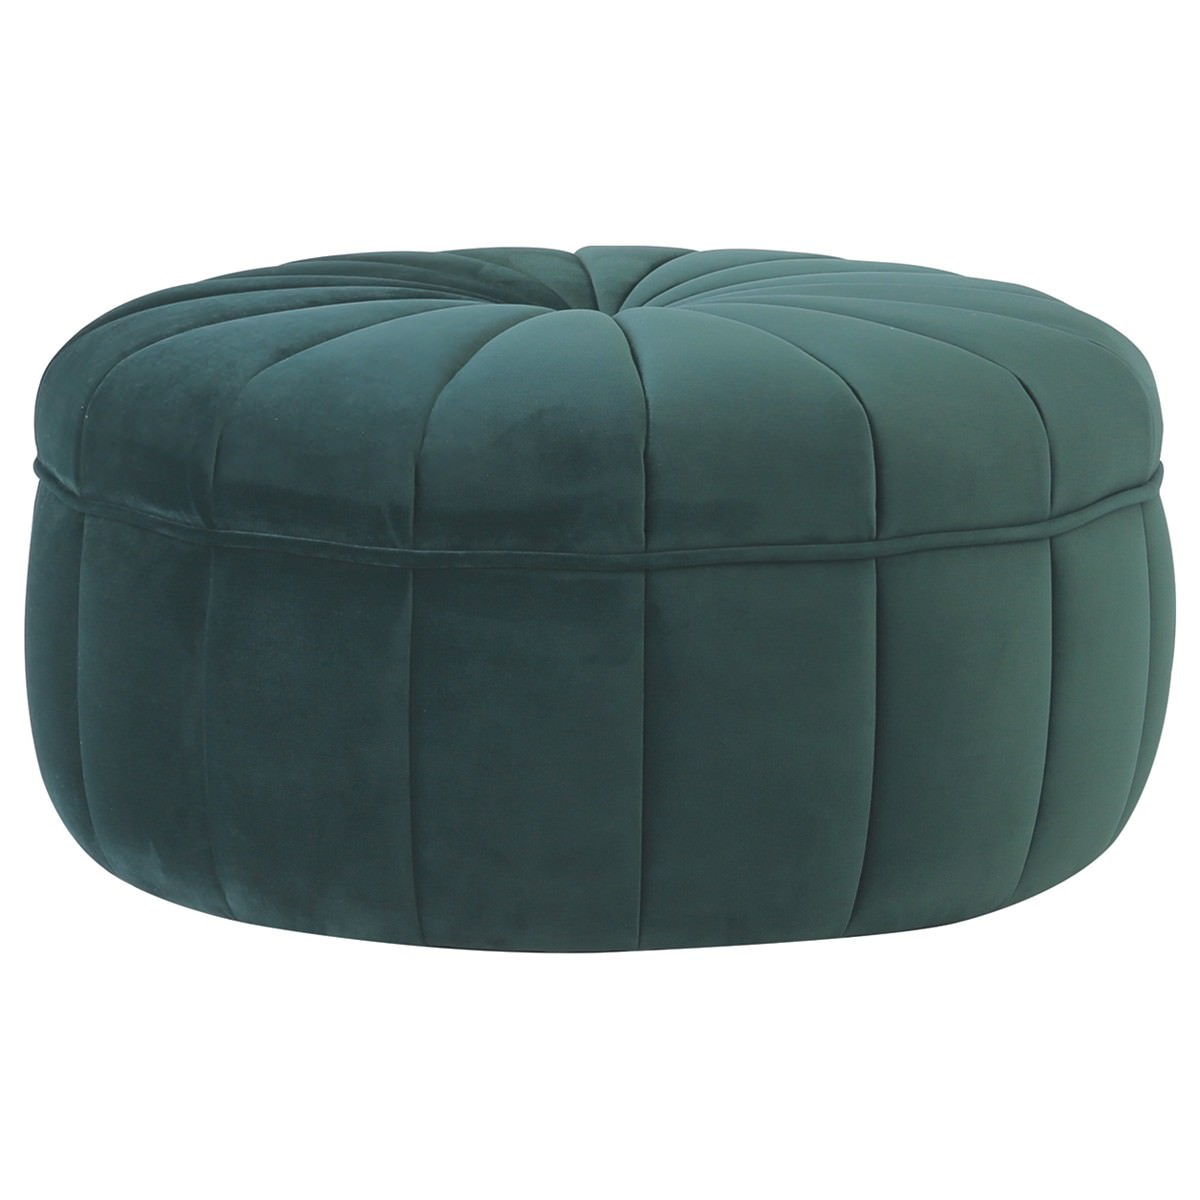 Probe Fabric Round Ottoman, Emerald